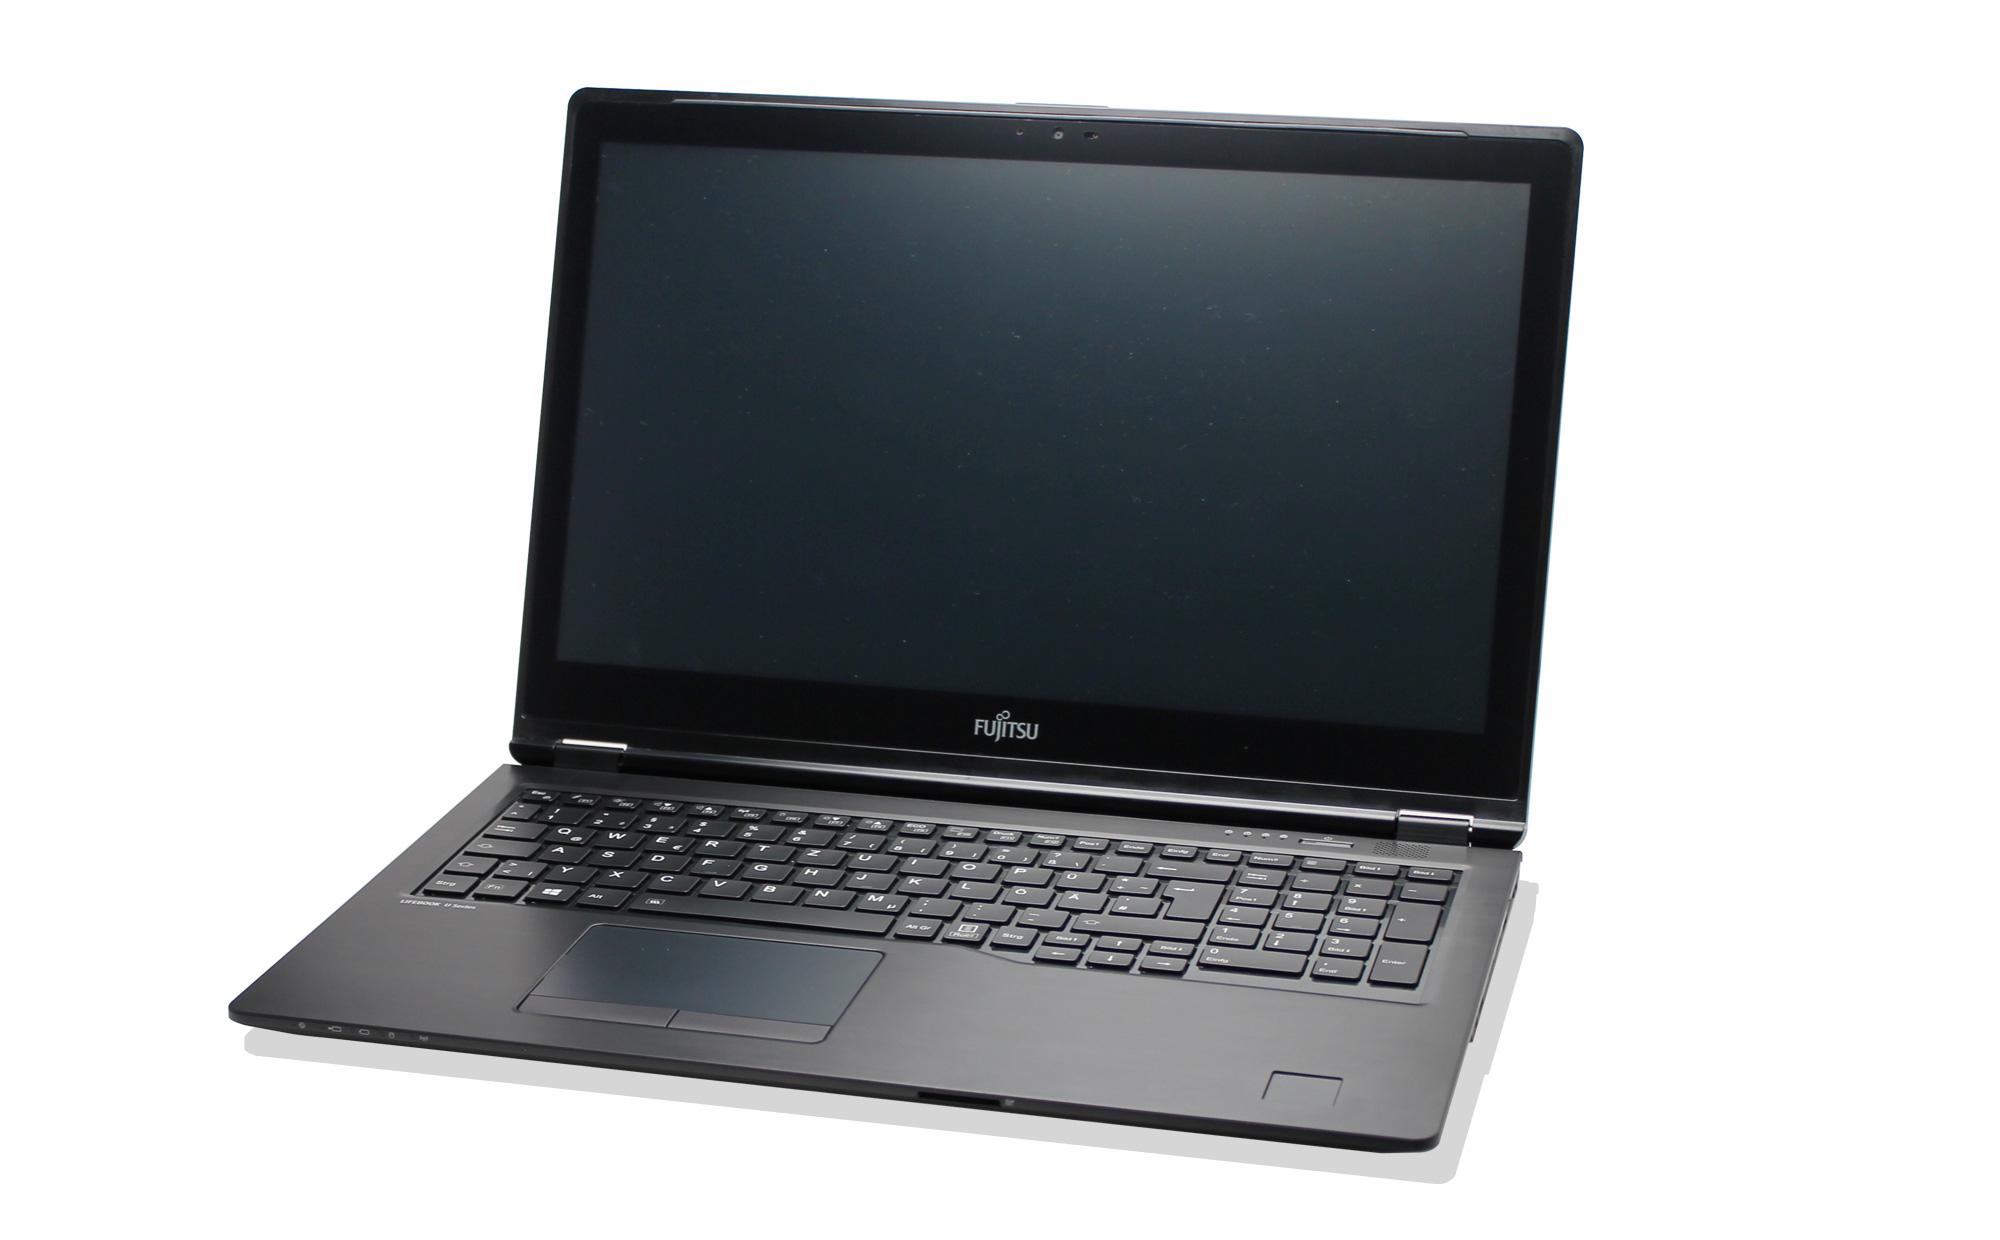 Fujitsu LIFEBOOK U7510 - Intel® Core™ i5 Prozessoren der 10. Generation - 1,7 GHz - 39,6 cm (15.6 Zoll) - 1920 x 1080 Pixel - 8 GB - 512 GB